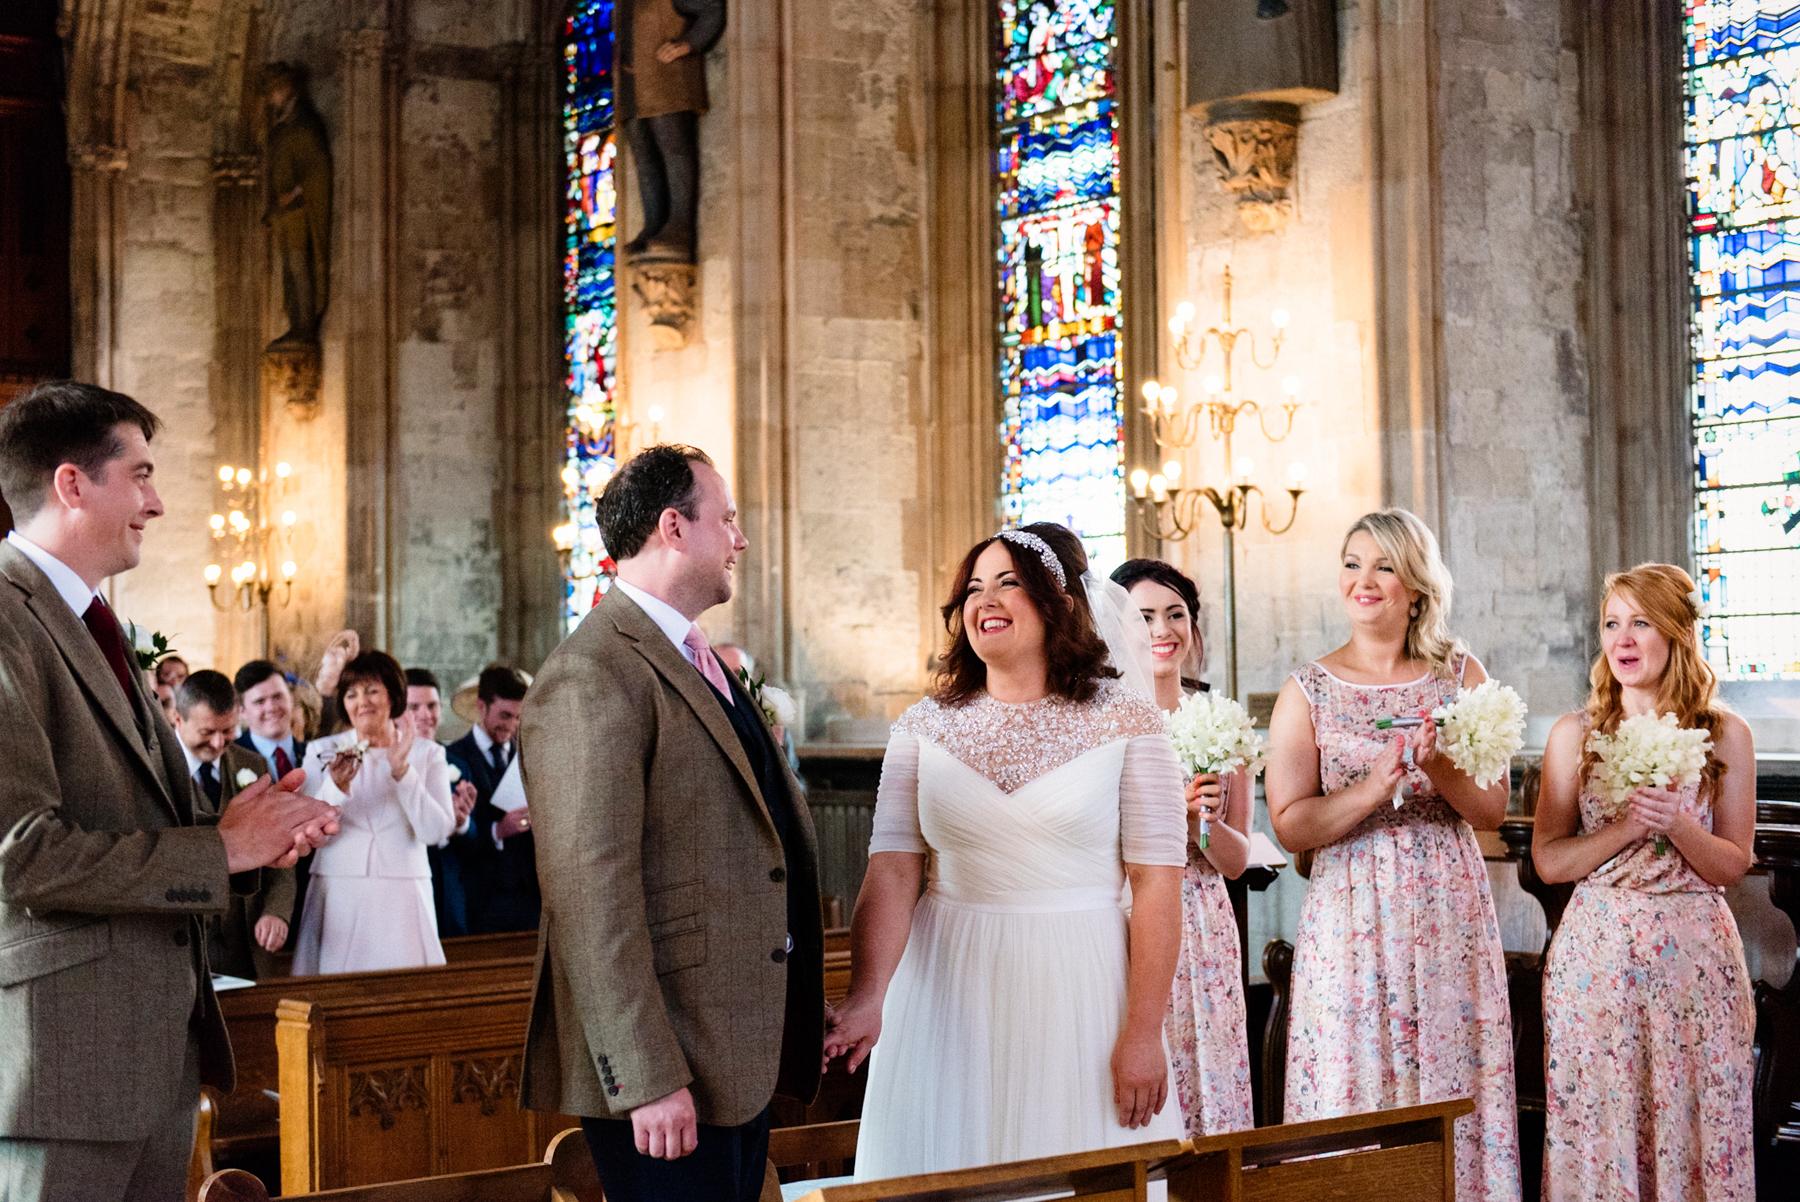 Wedding at St Etherdreda's London